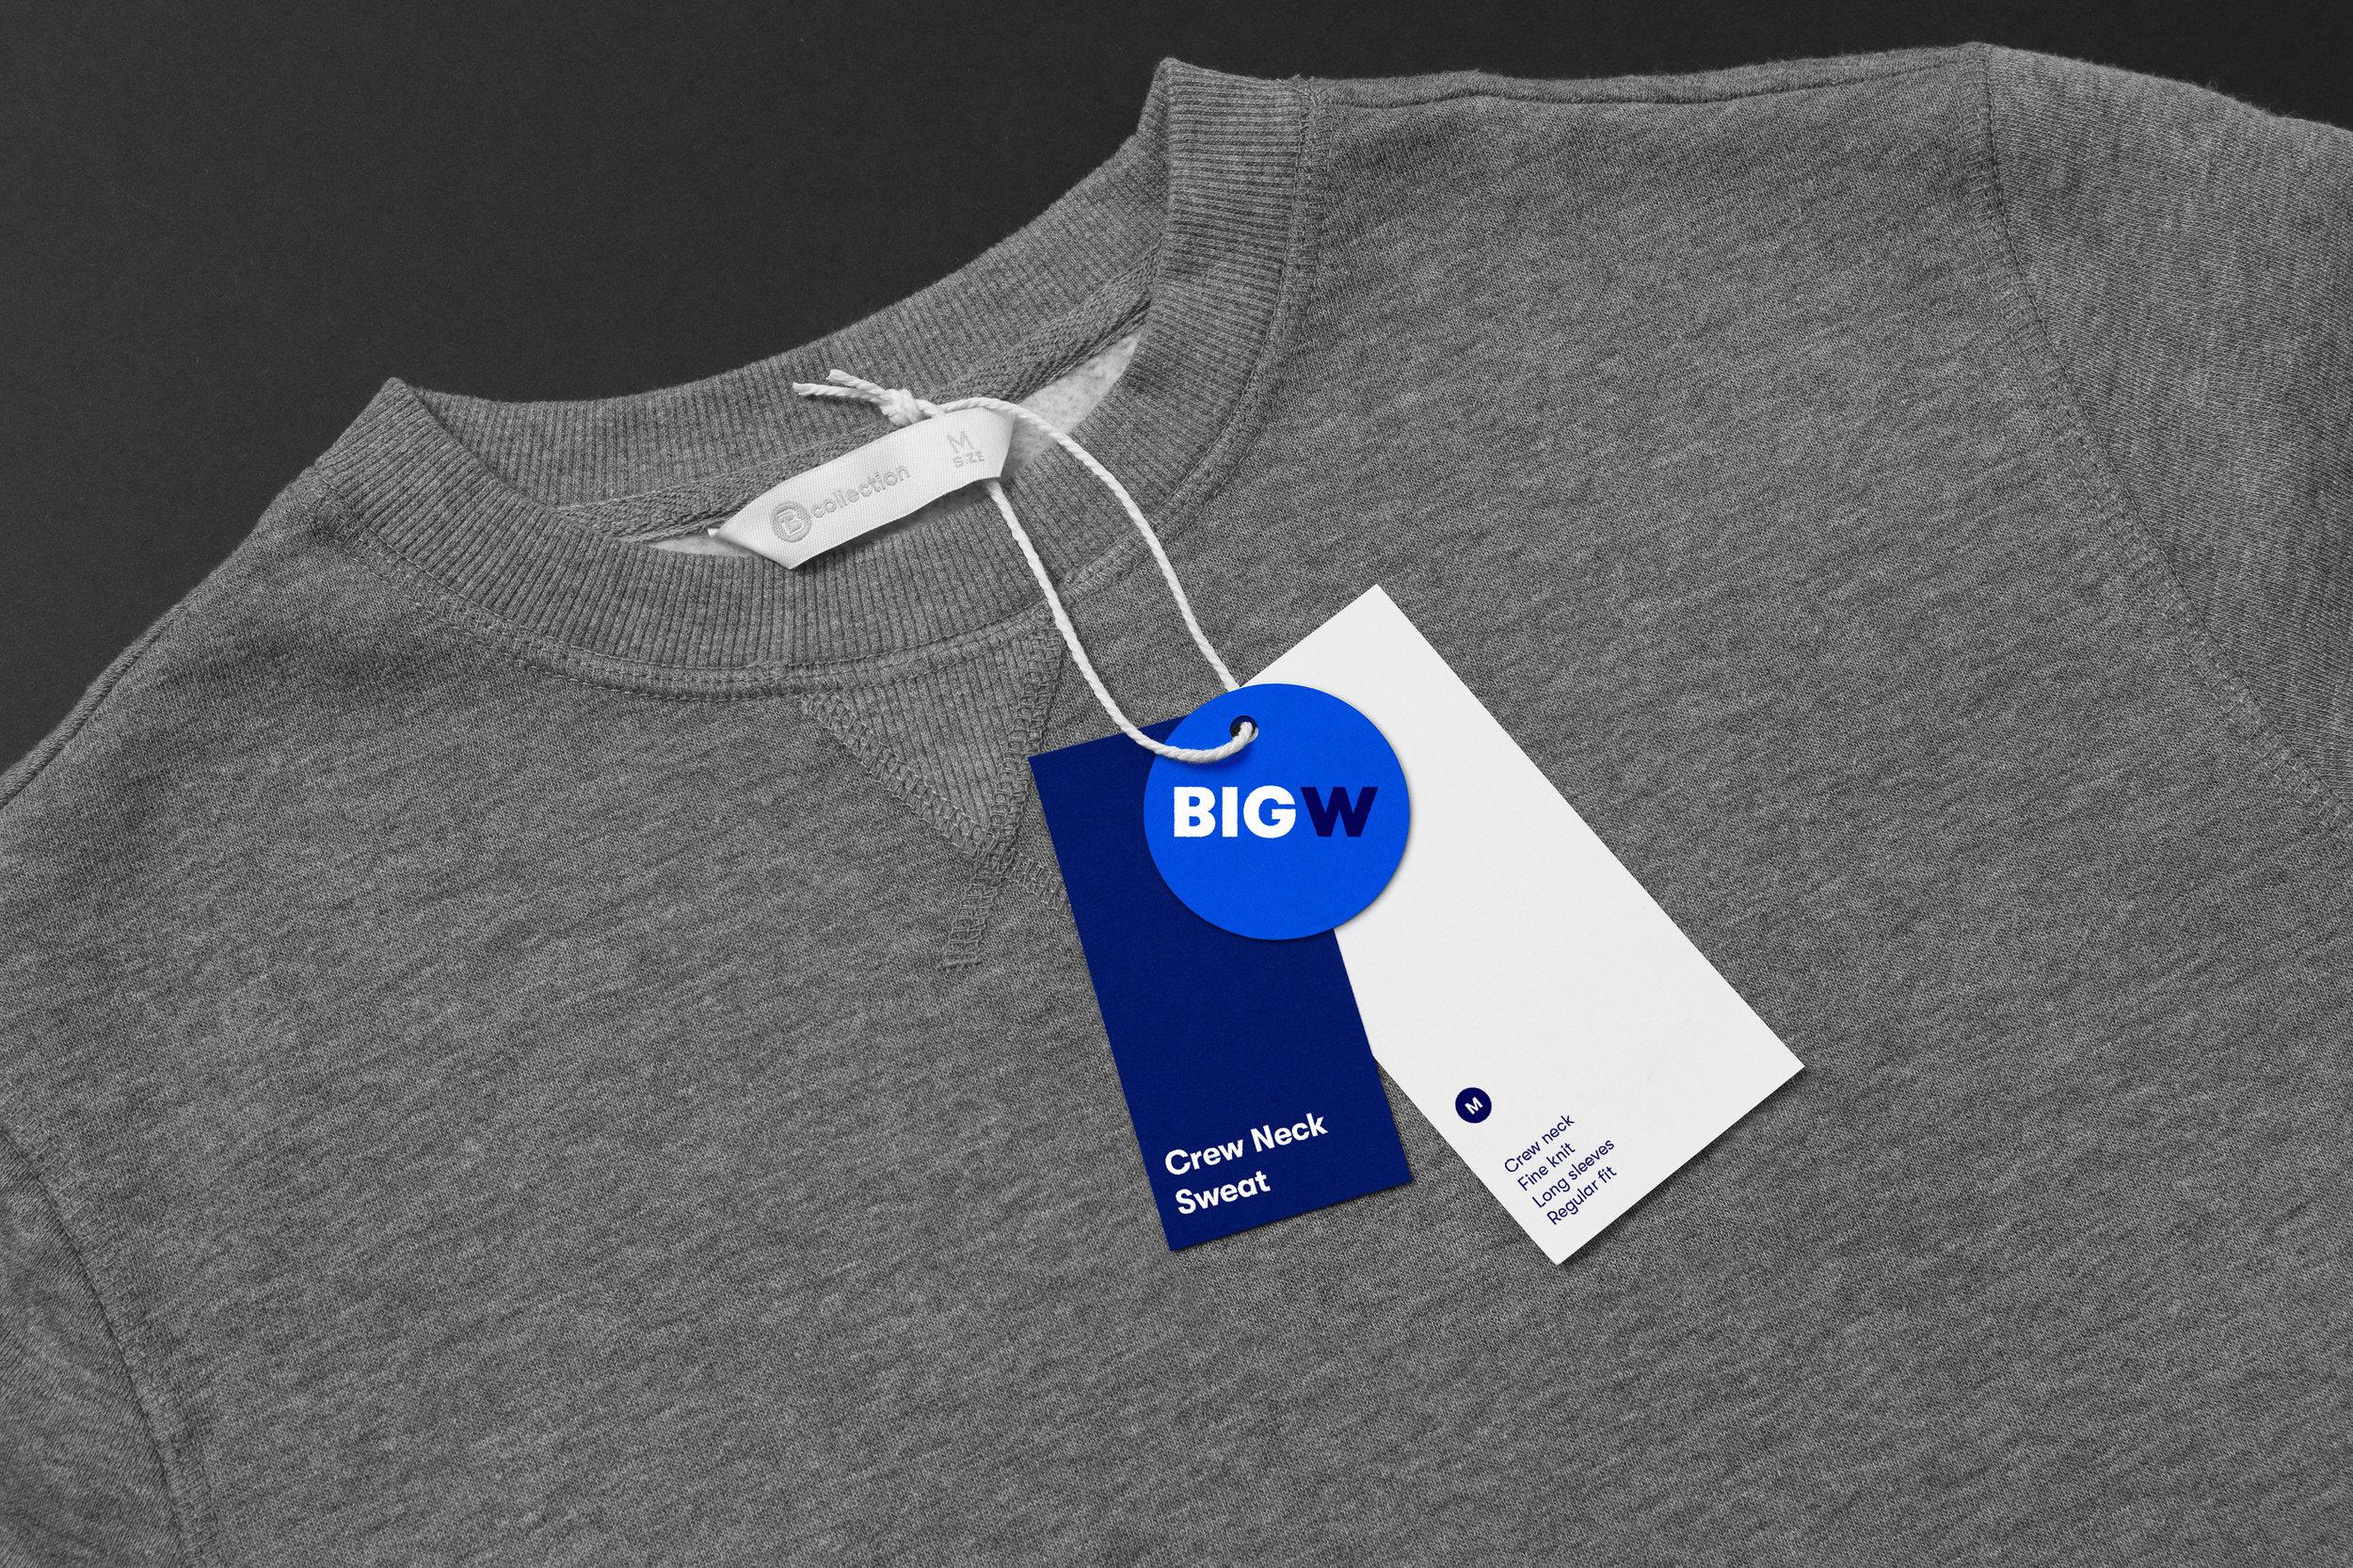 ReAgency_BigW_Sweat_MedRes_Digital_01.jpg